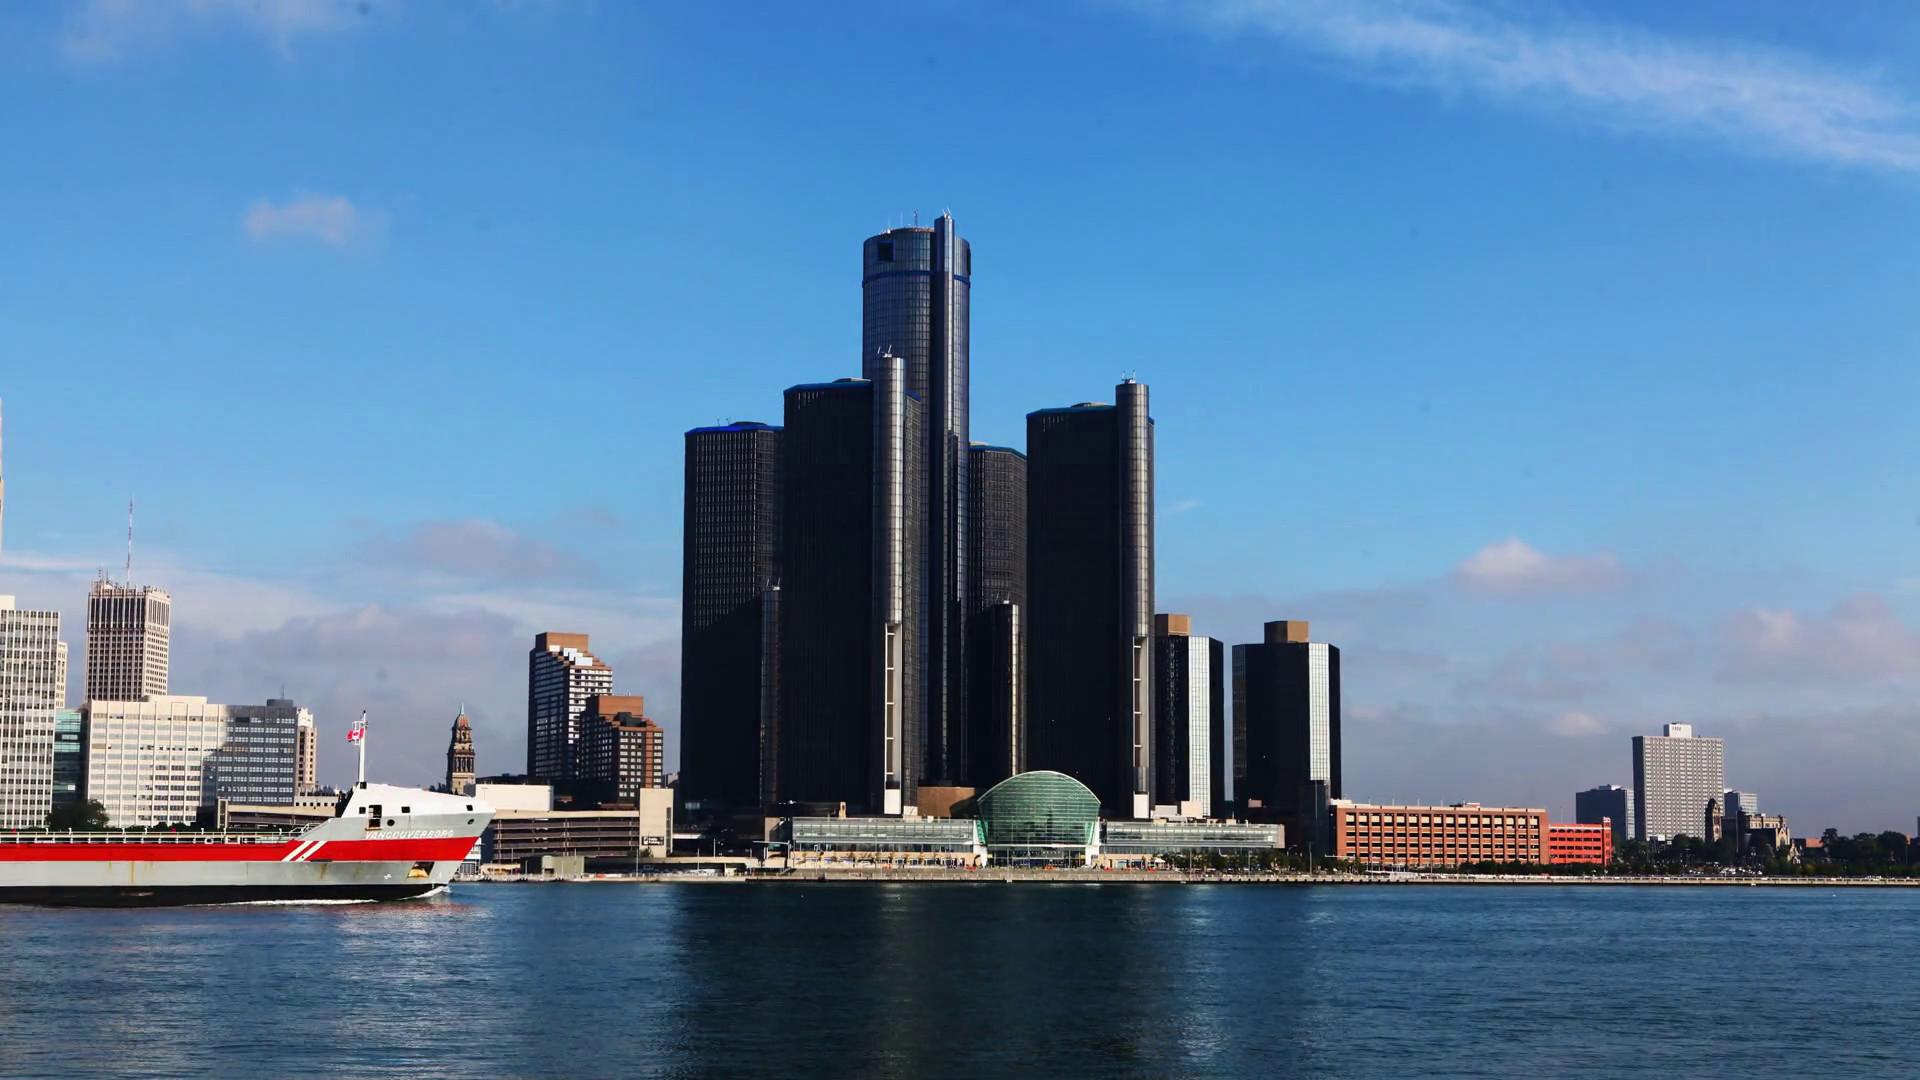 Detroit Skyline Wallpaper Posted By Michelle Peltier